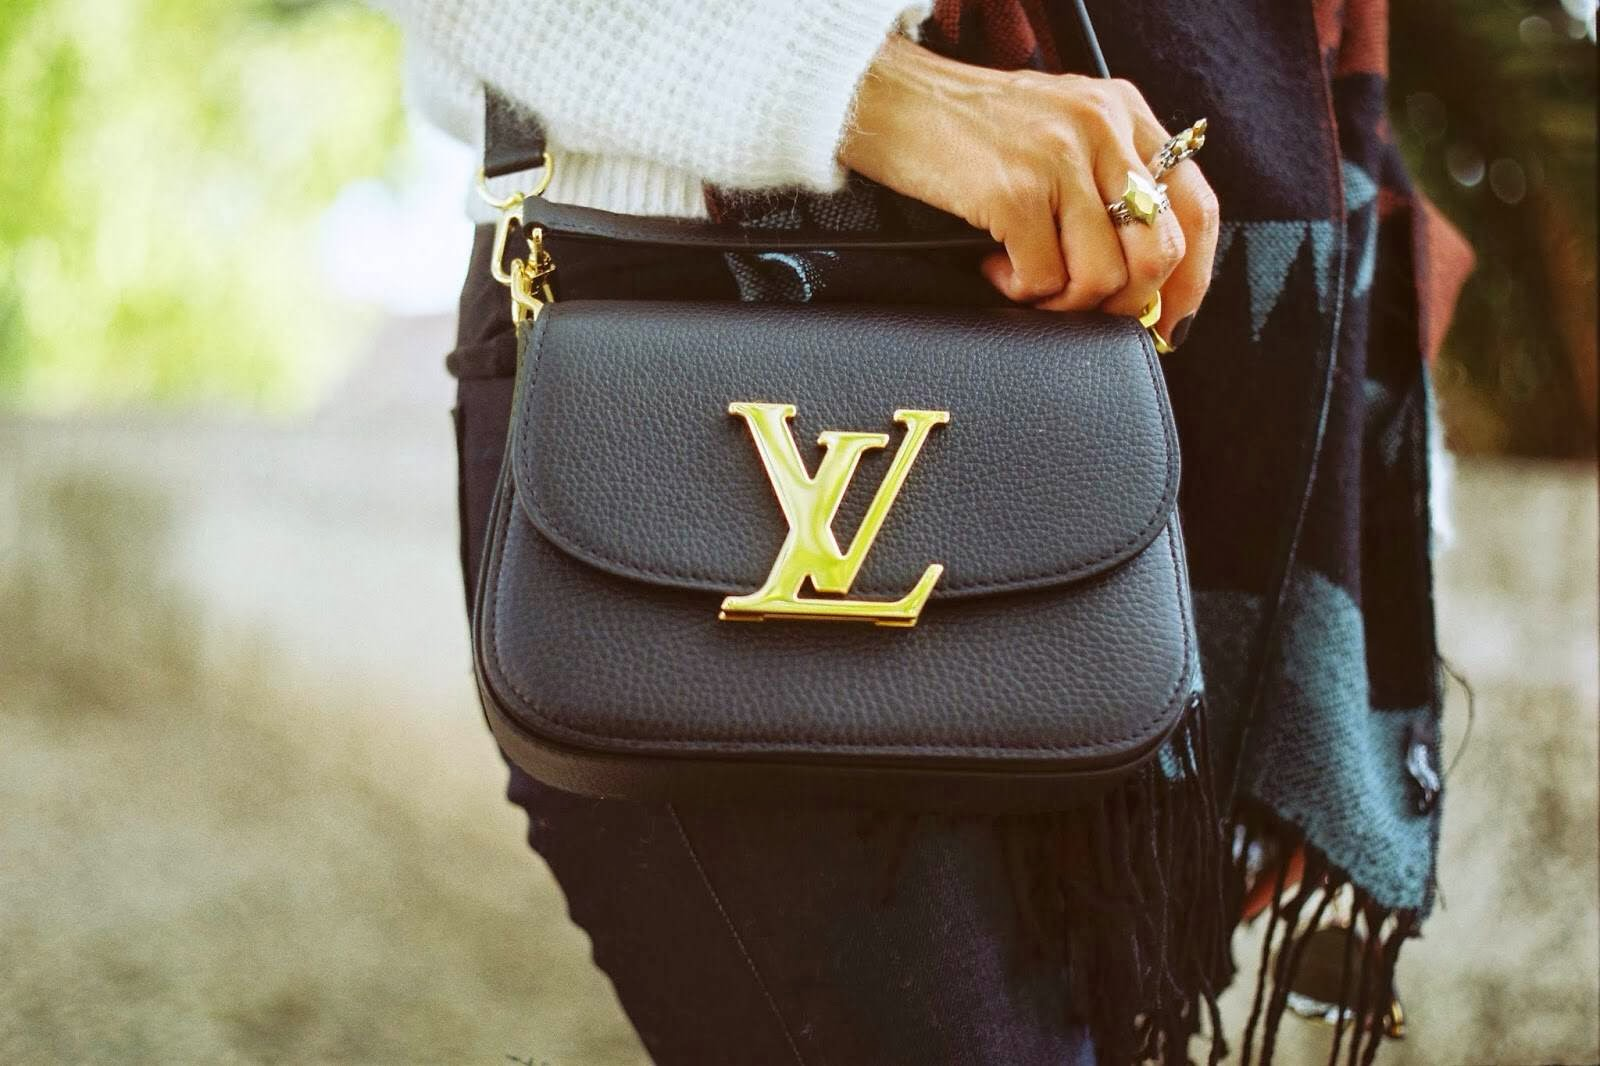 b04b07d4dcd24b Louis Vuitton Vivienne - The Handbag Concept